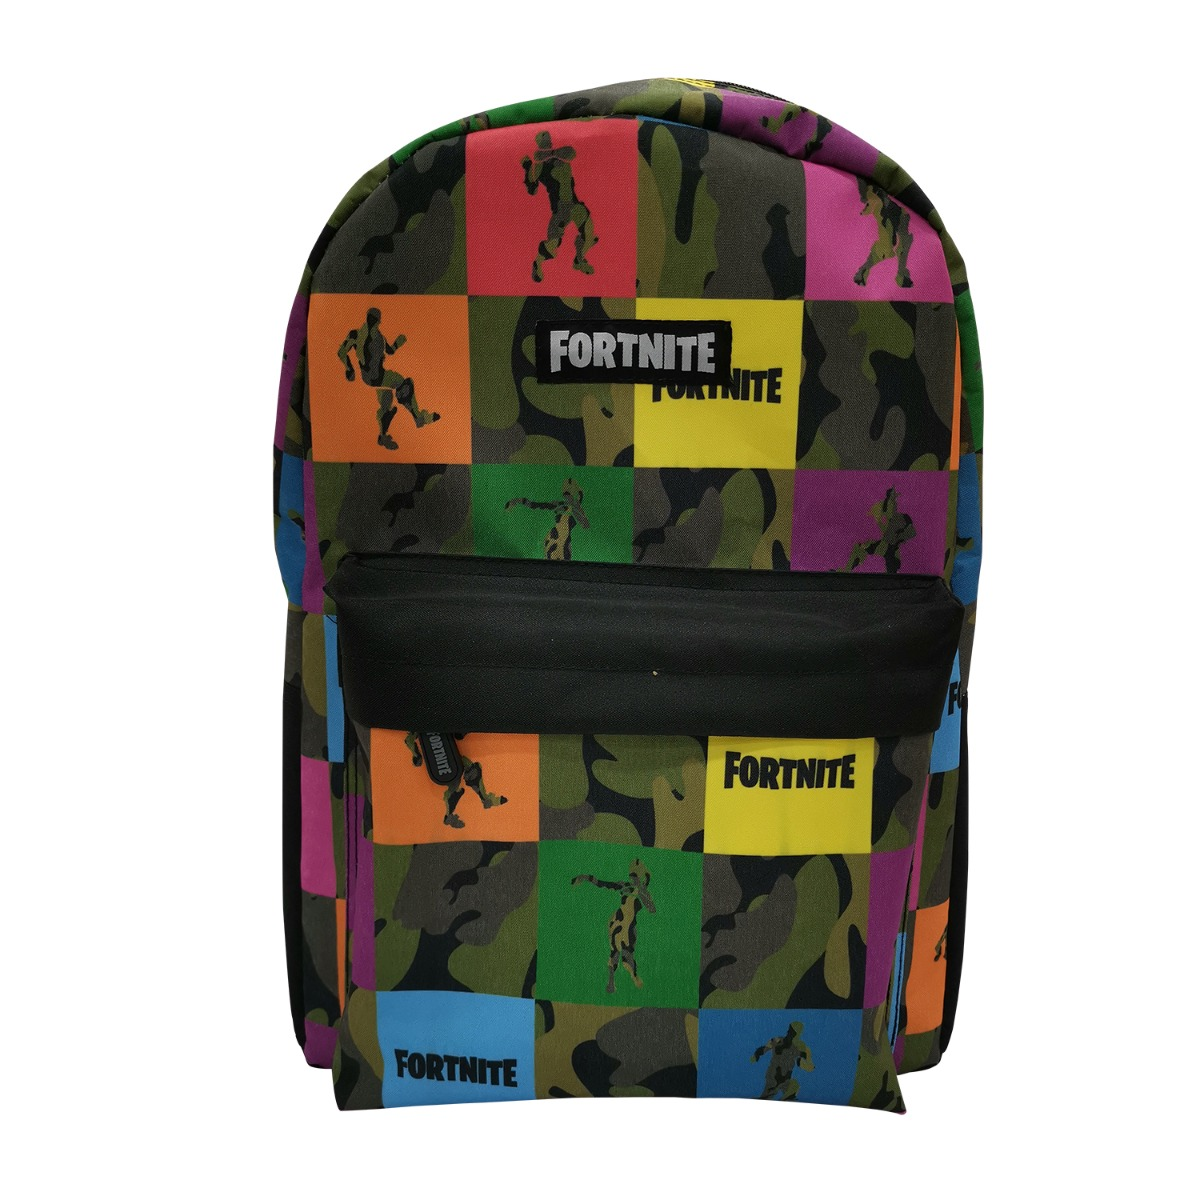 Rucsac cu imprimeu Fortnite, 45 cm, Multicolor